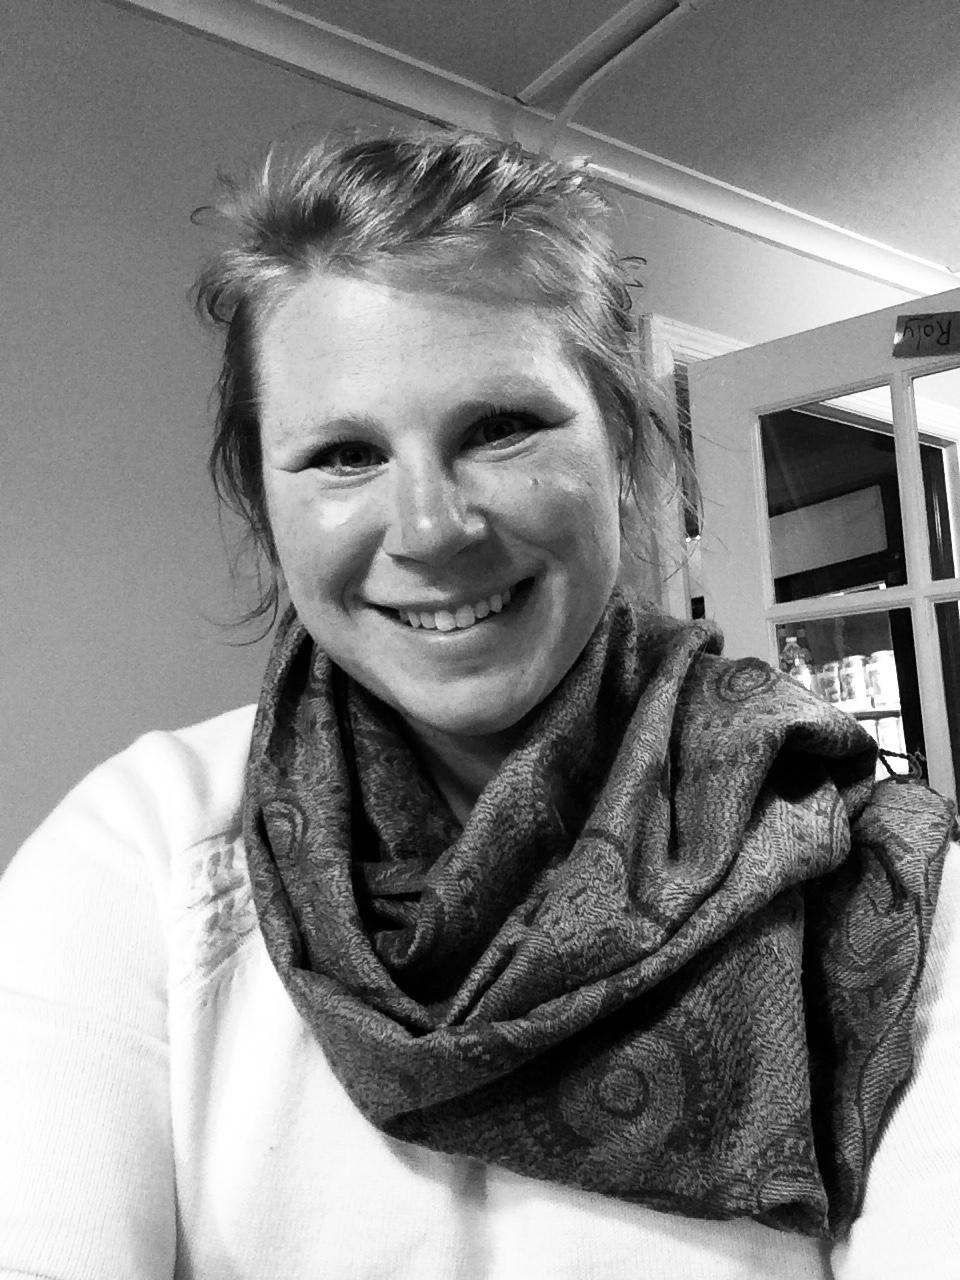 Allissa goodale - Wine Educator at the Peconic Cellar DoorWhat is your favorite part about working for Peconic Cellar Door?